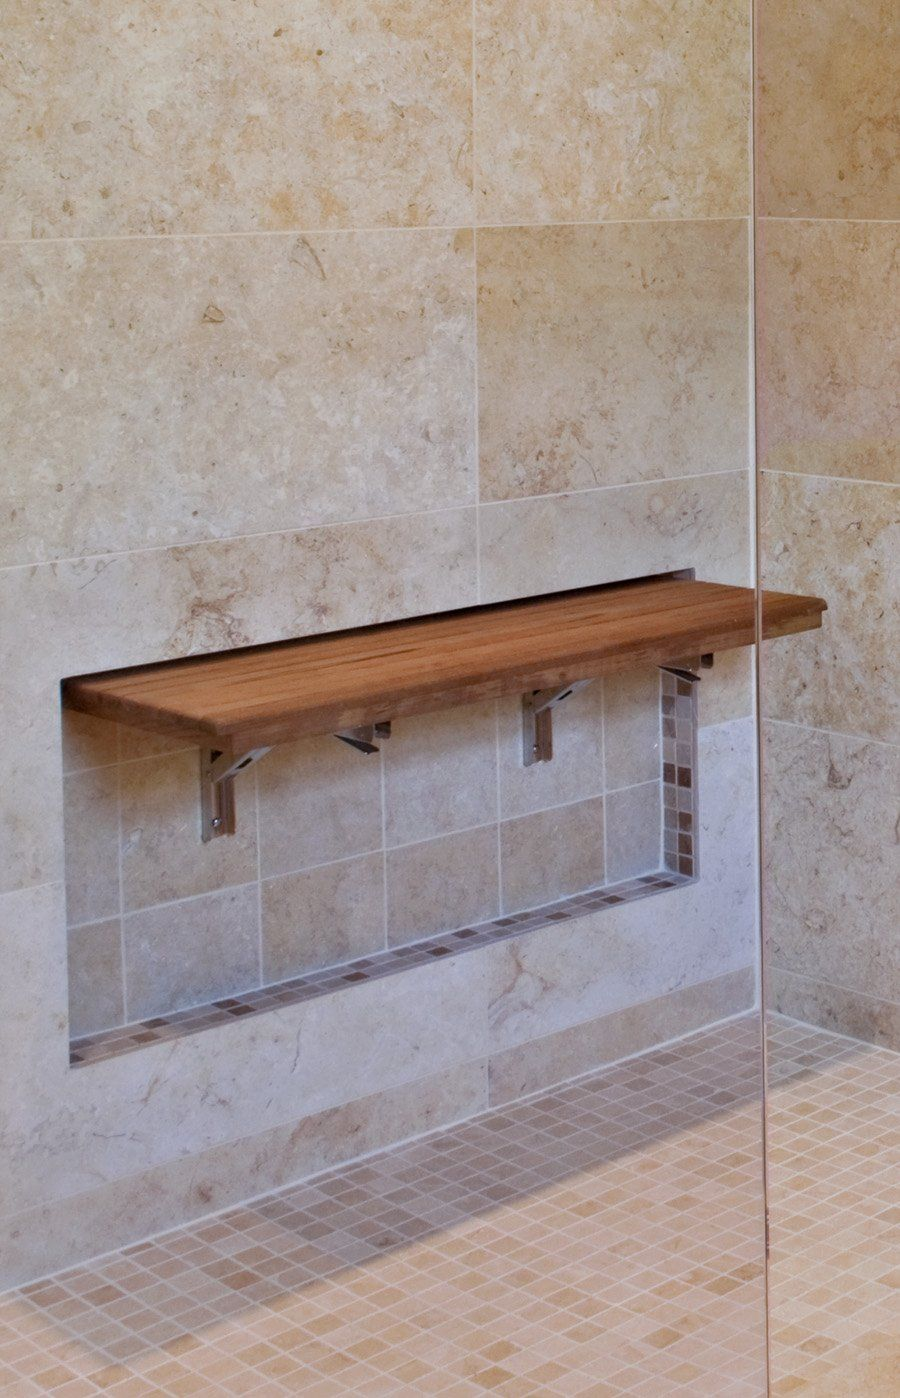 Recessed Teak Wall Mount Fold Down Shower Bench Seat Teak Shower